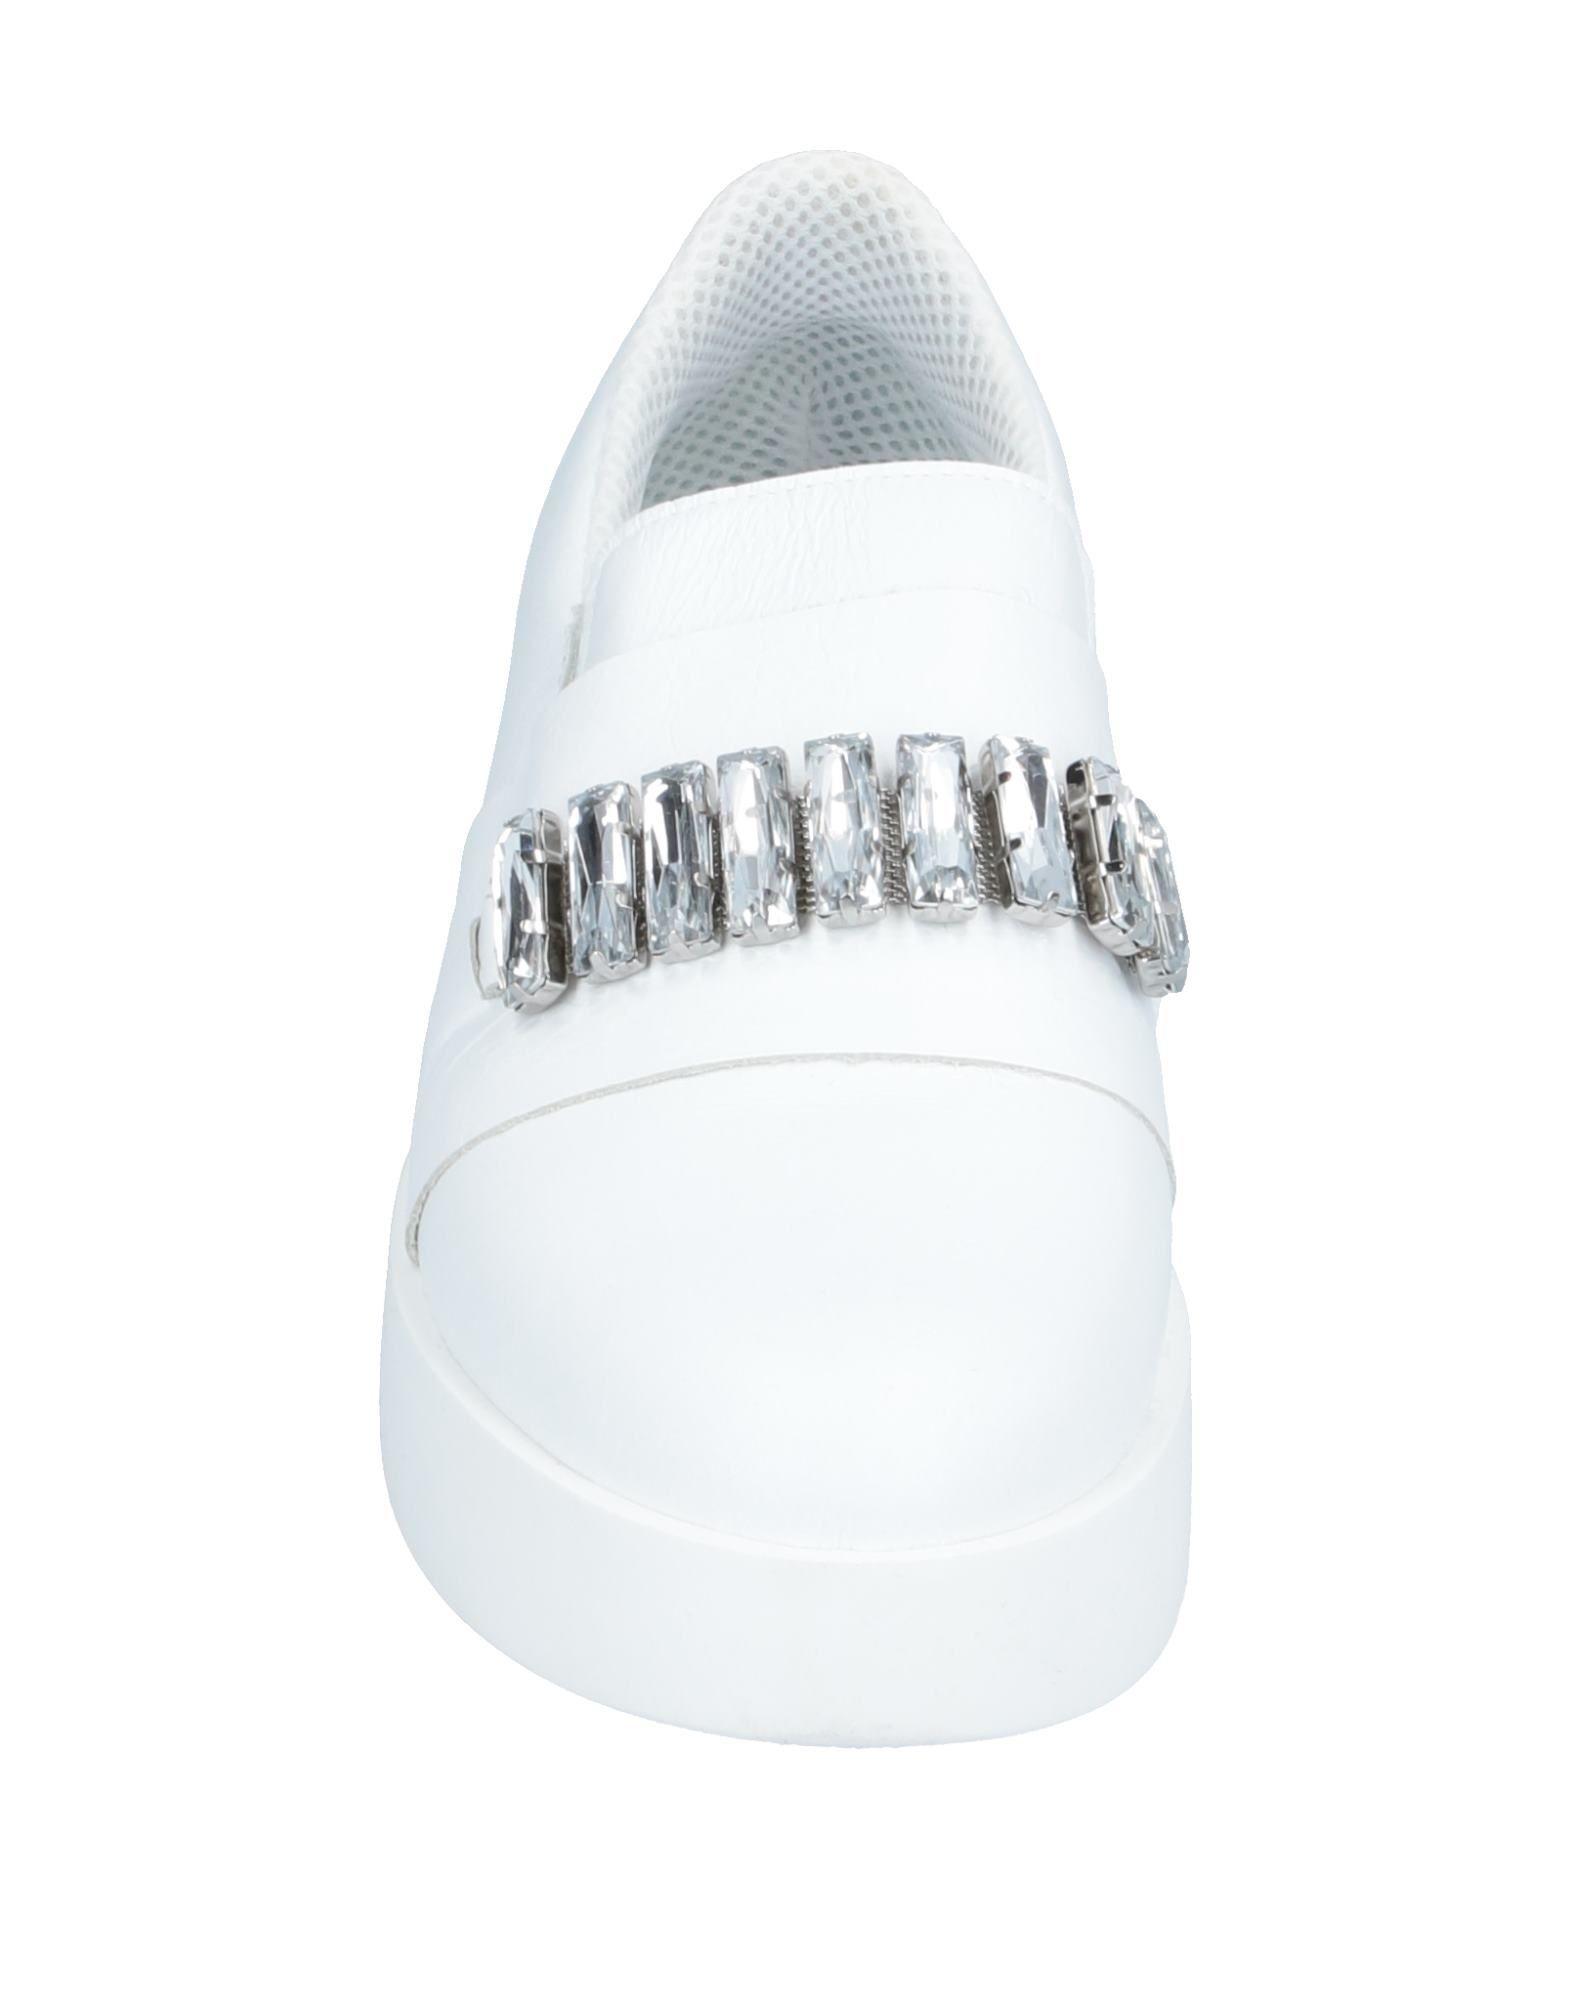 Annarita N. Leder Low Sneakers & Tennisschuhe in Weiß nunMB